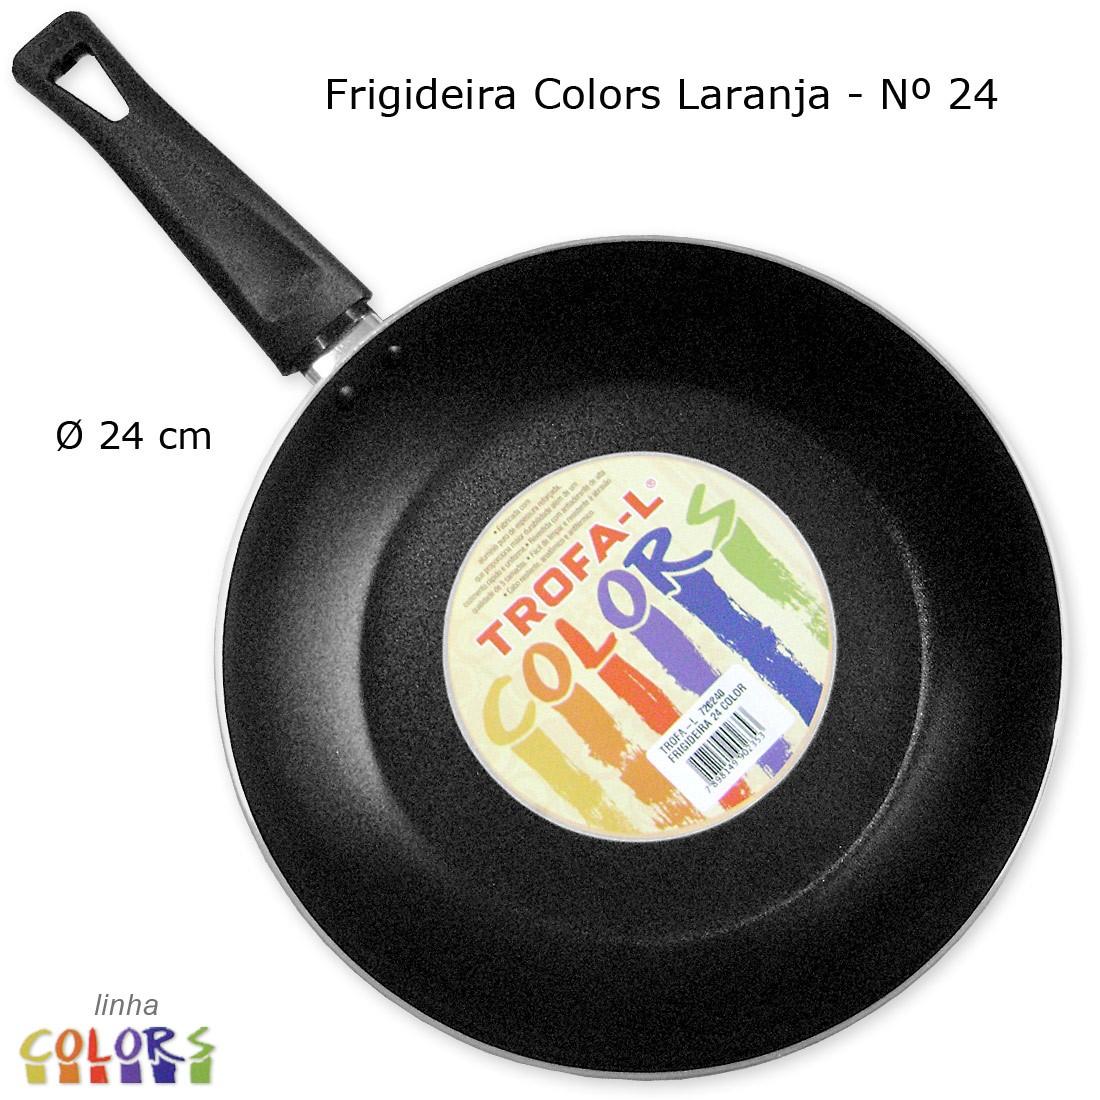 Frigideira Colors Laranja Antiaderente 24 cm - Trofa-L